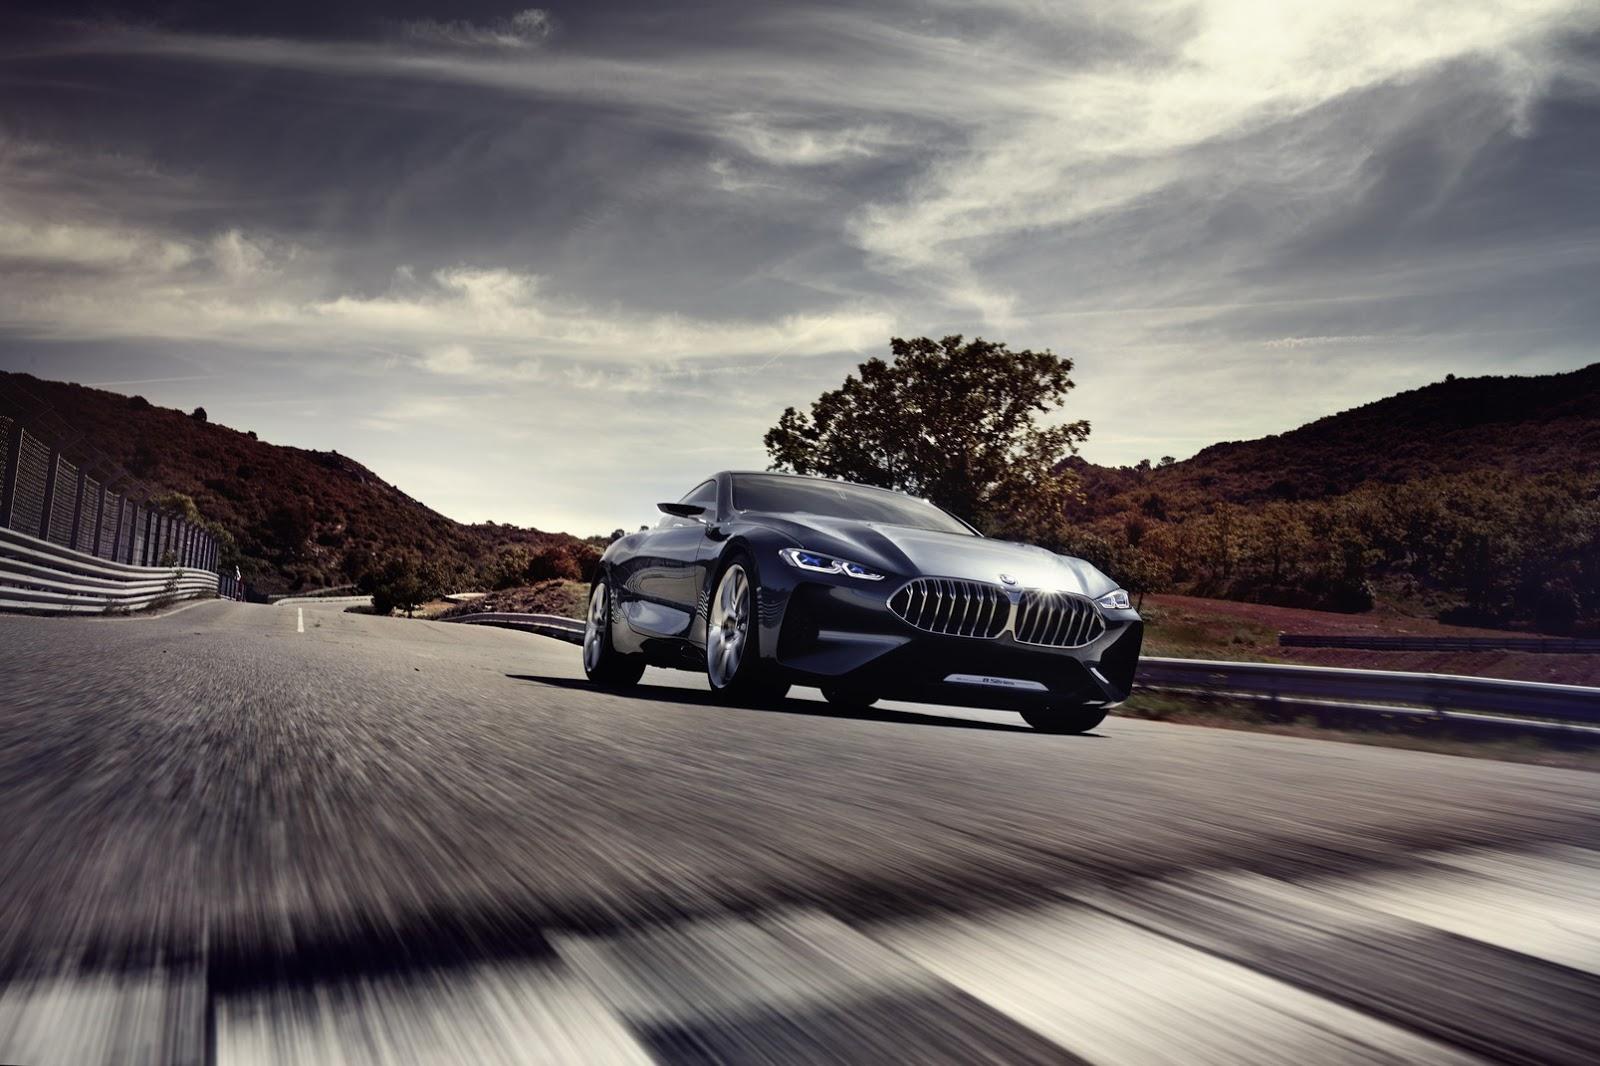 BMW_Concept_8_Series_13